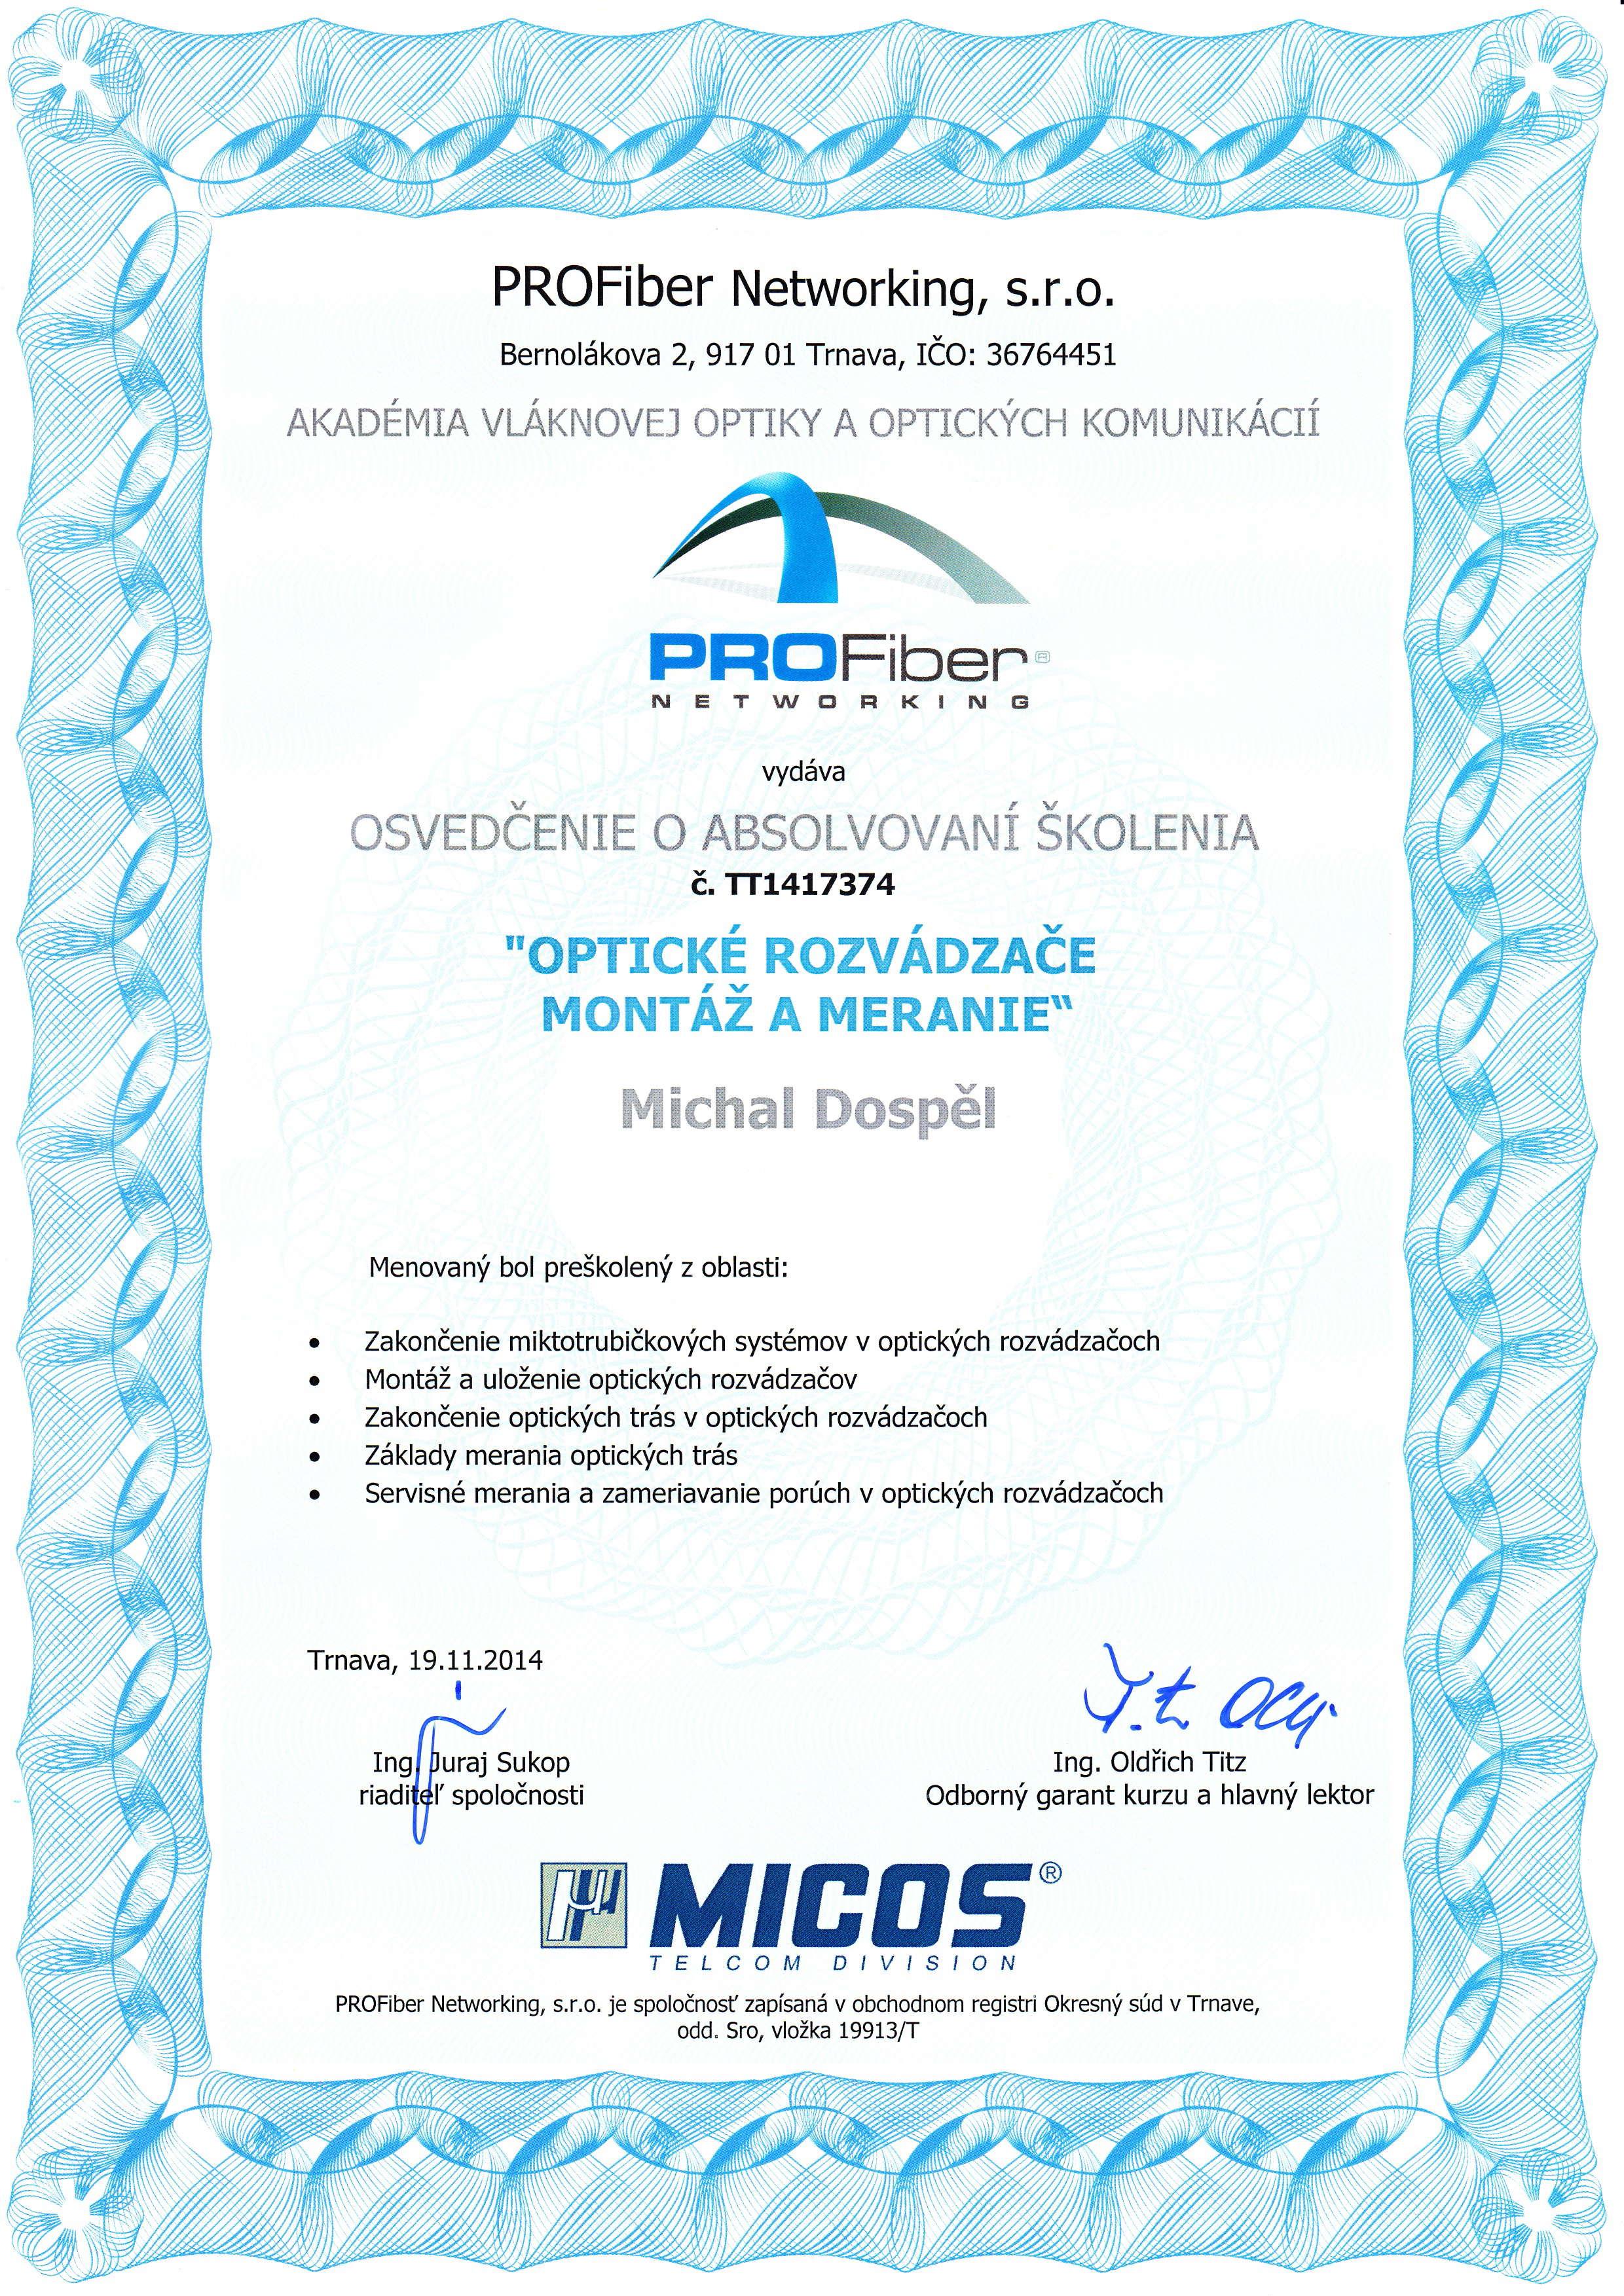 Certifikat opticke rozvadzace montaz a meranie Michal Dospel